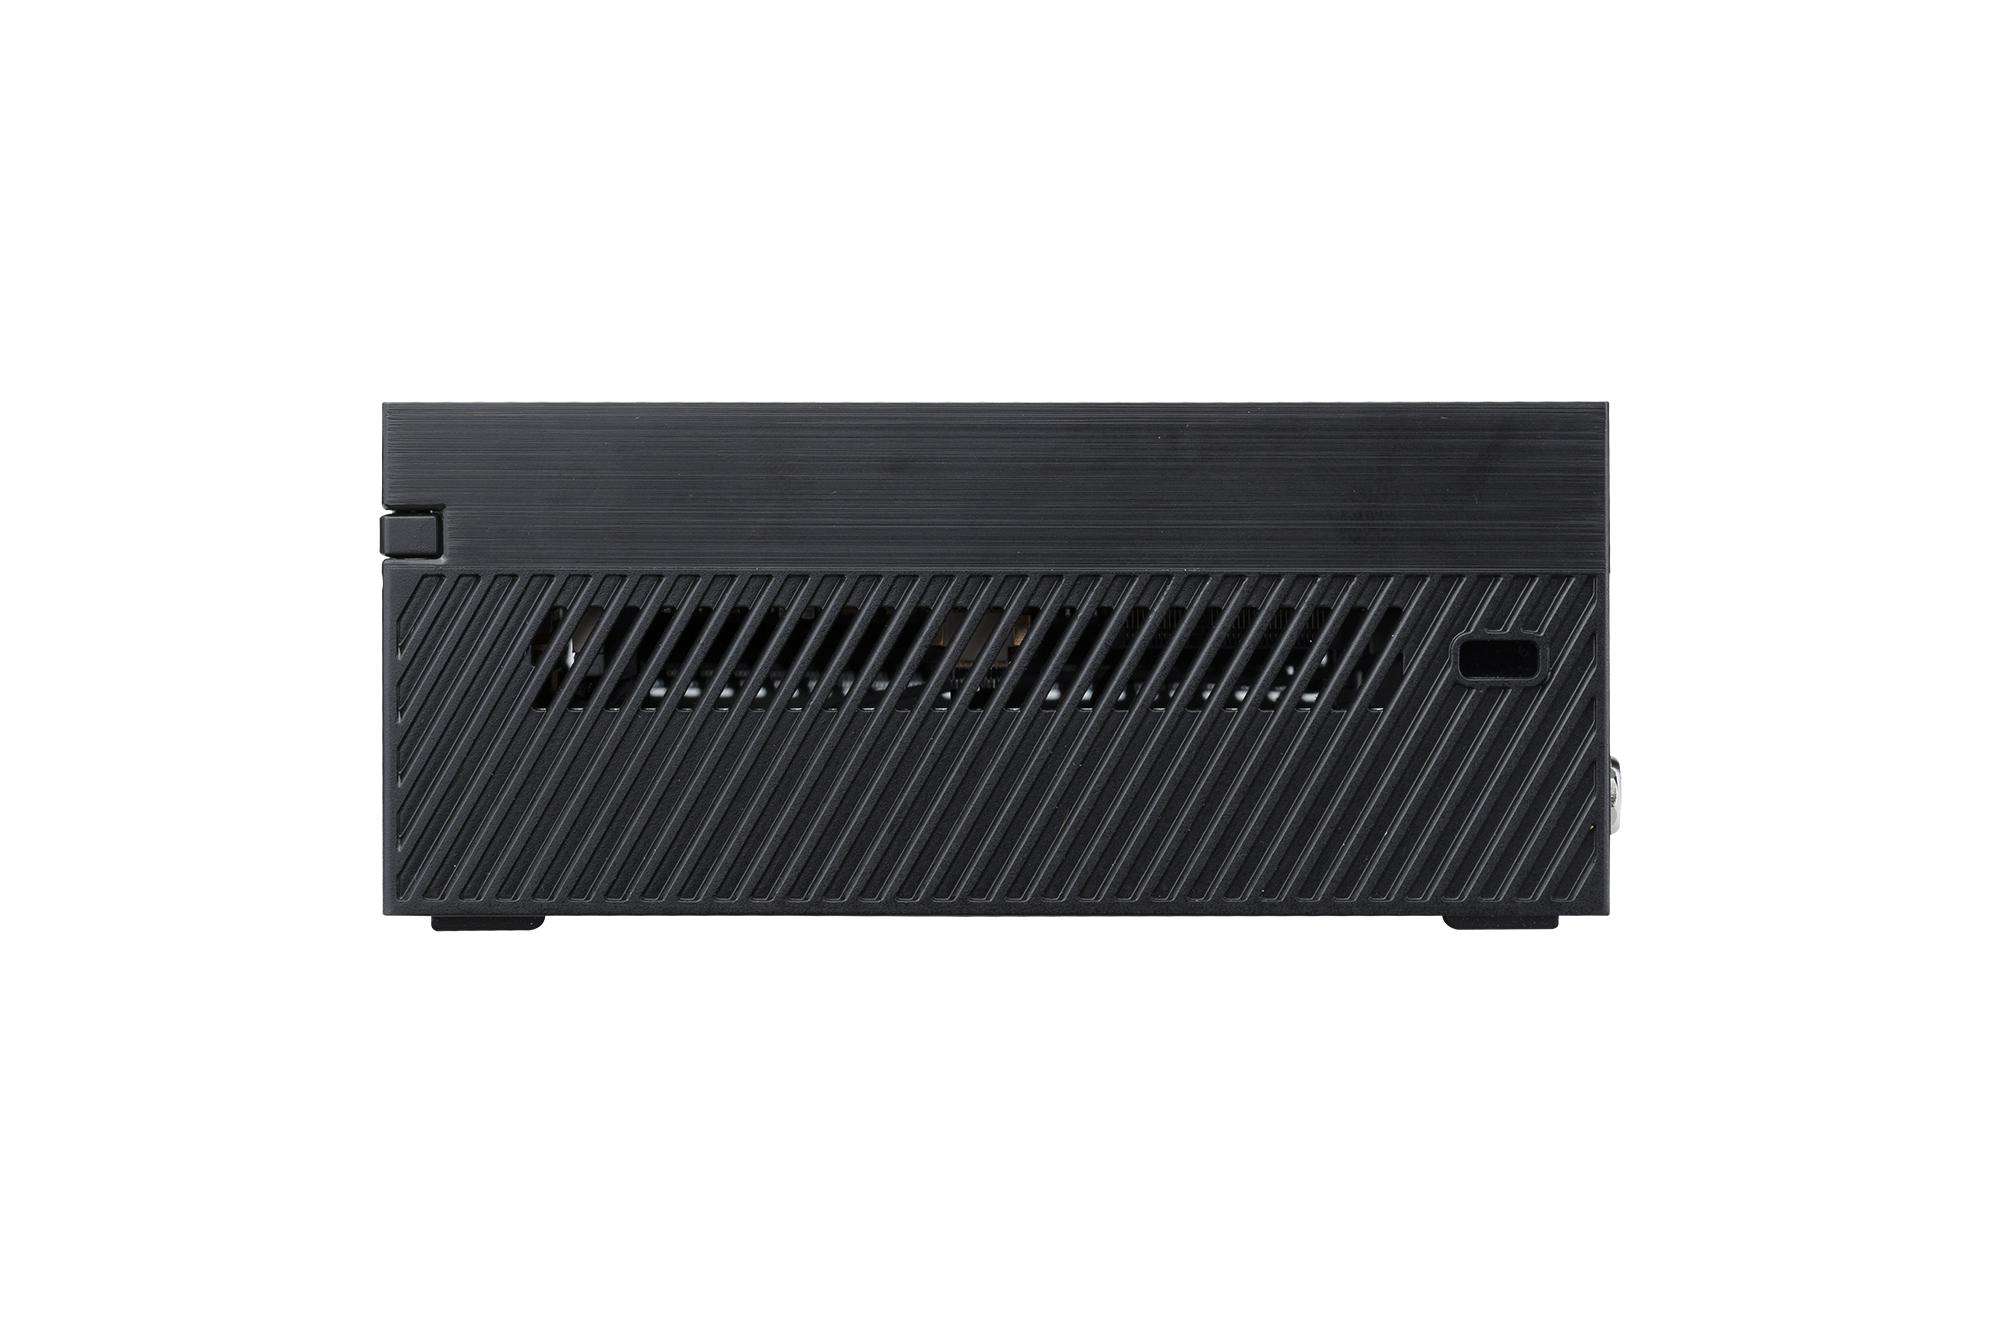 ASUS Mini PC PN61 BB7009MT - Barebone - mini PC - 1 x Core i7 8565U - HD Graphics 620 - GigE, Blueto